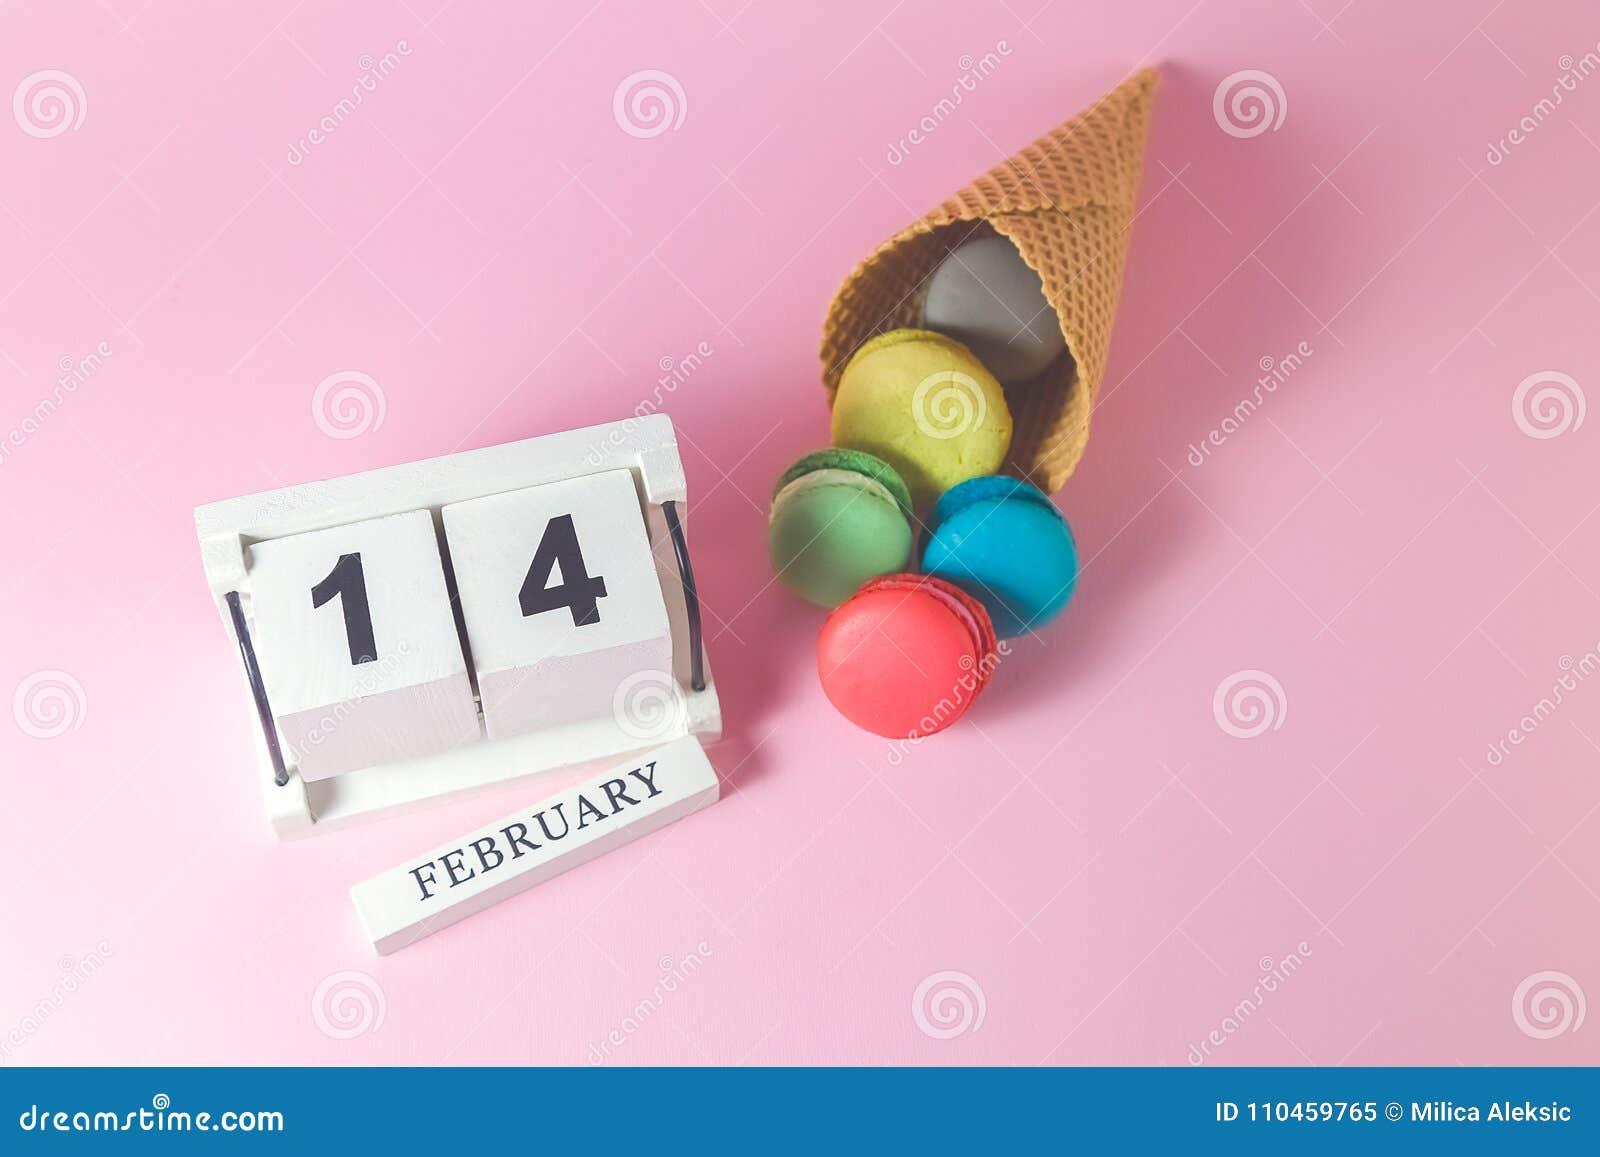 Färgrika macarons i glasskotte med träkalendern